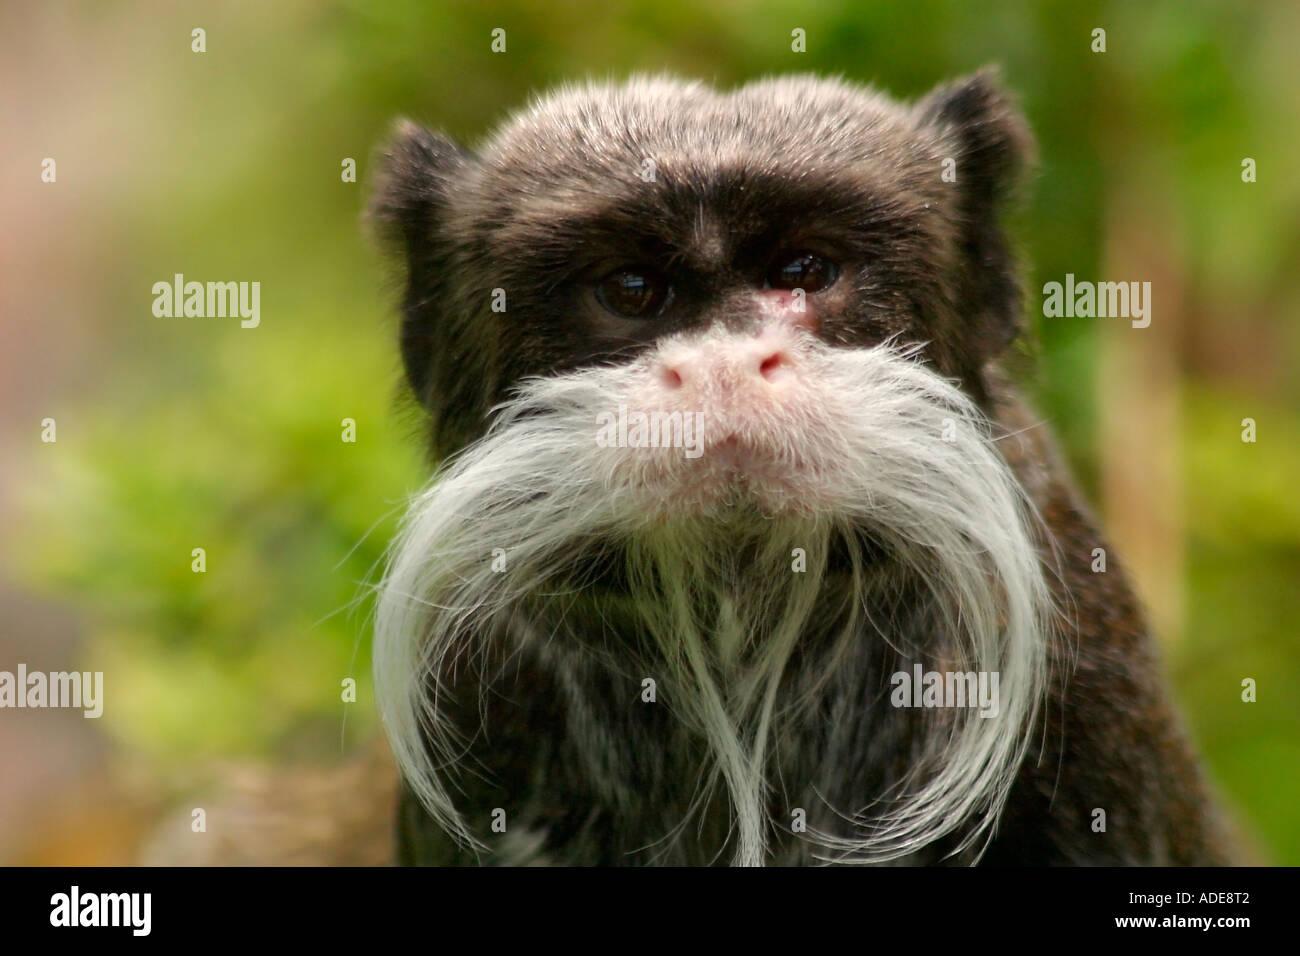 Emperor Tamarin monkey staring - Stock Image